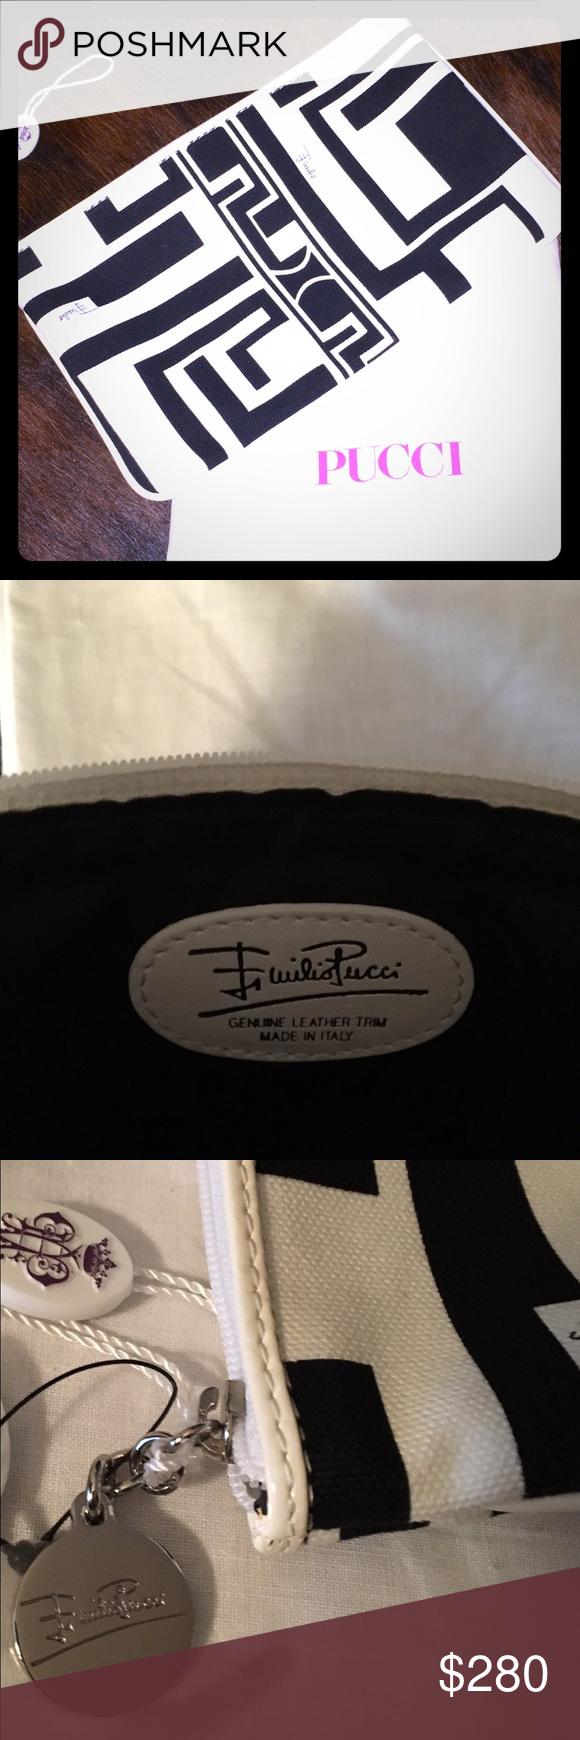 Emilio Pucci Cosmetics Bag NWT Brand New!  Authentic.  Retails $350 Emilio Pucci Bags Cosmetic Bags & Cases